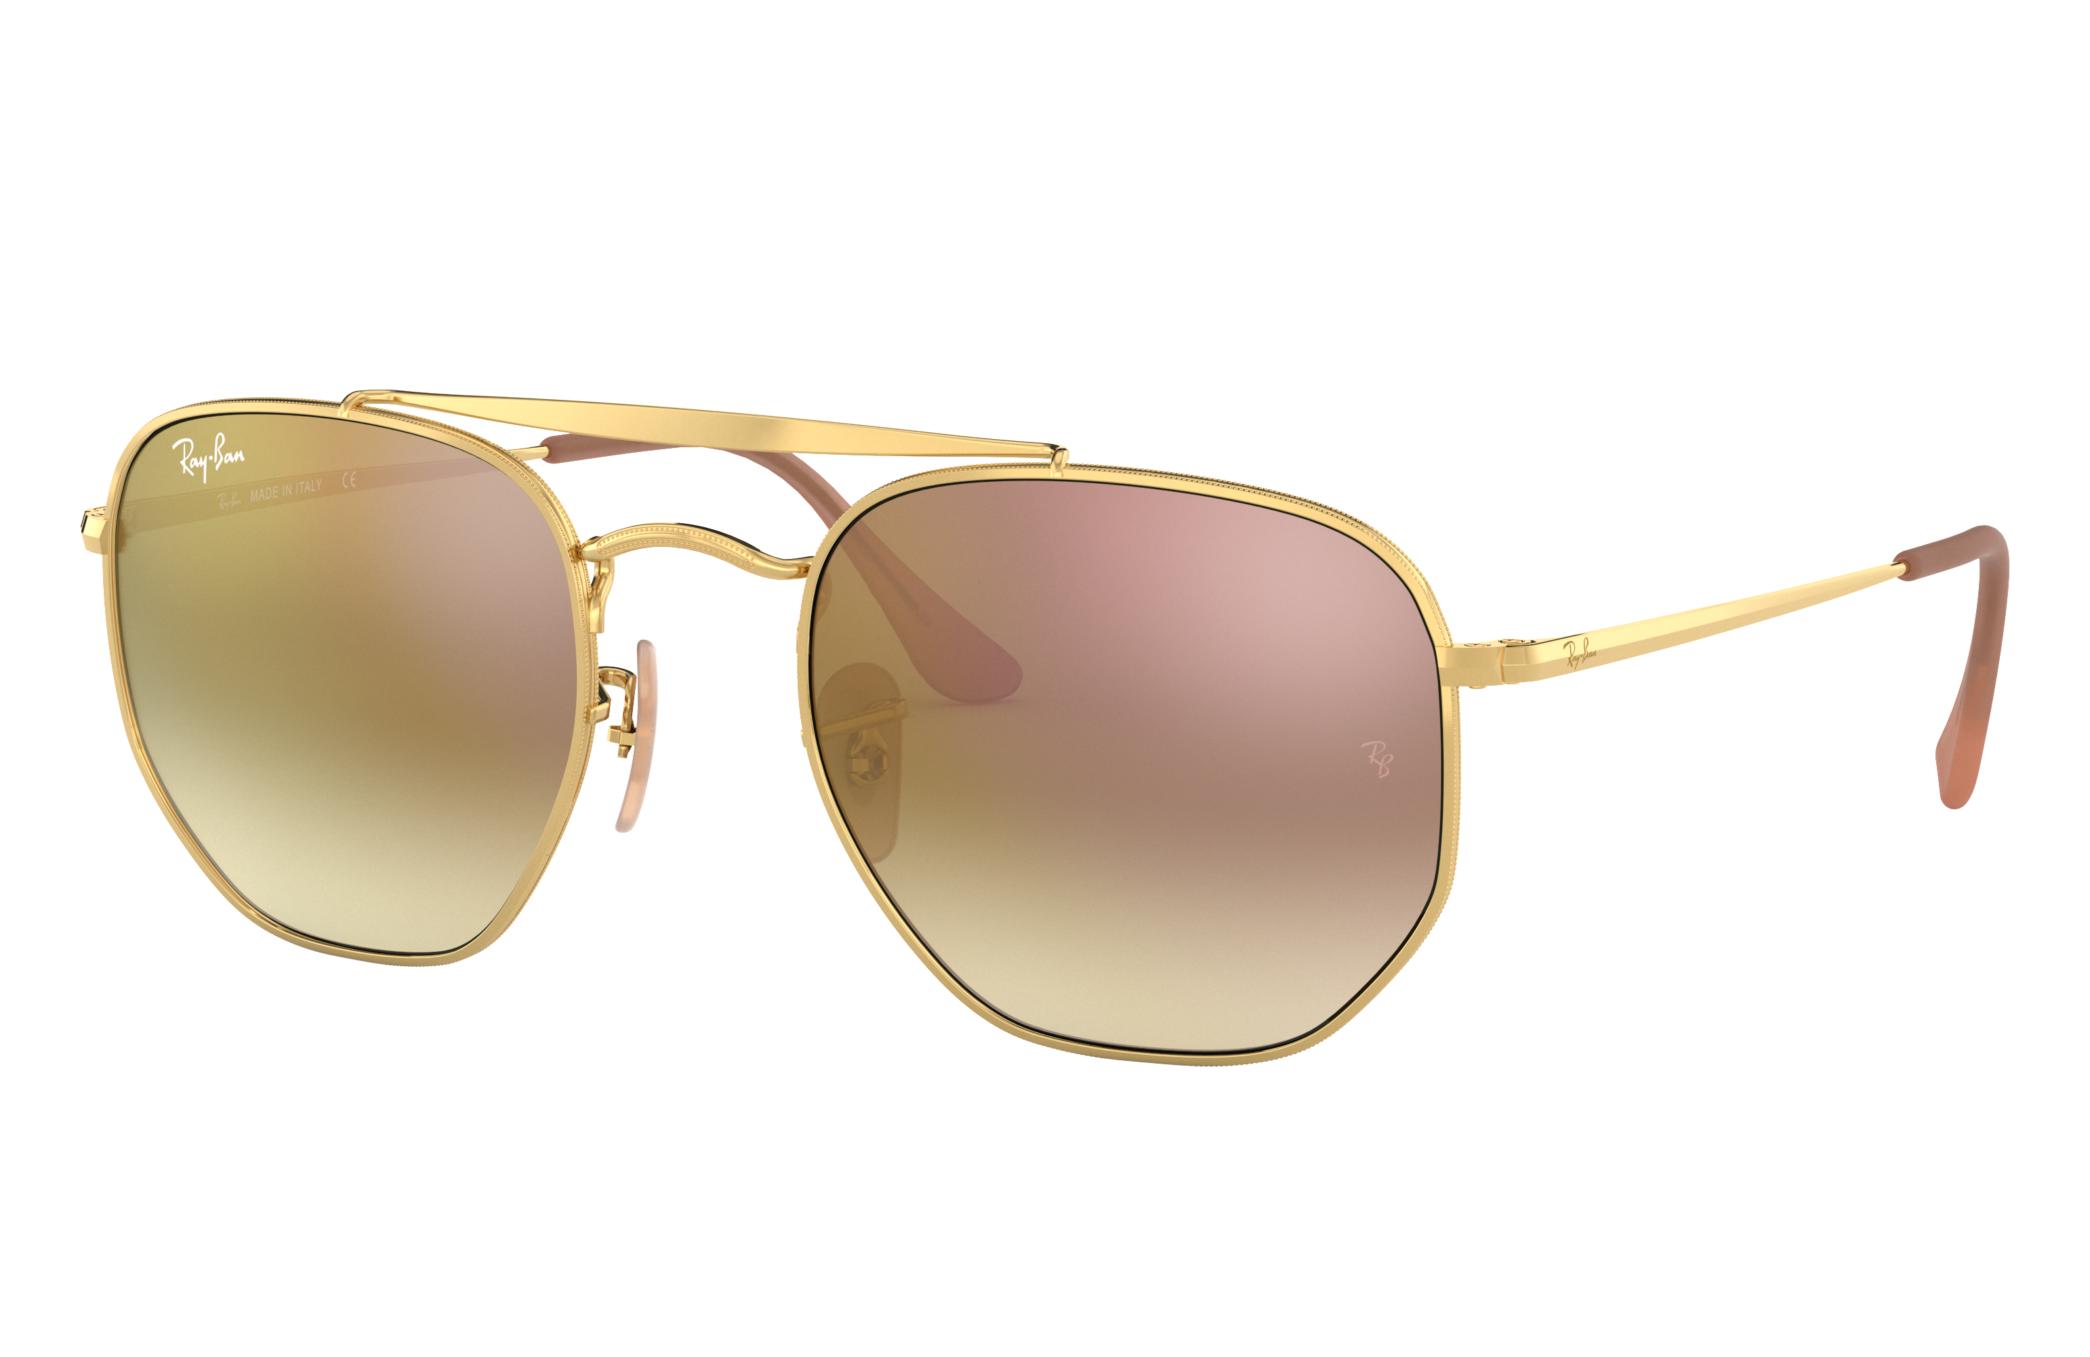 Ray-Ban Marshal Gold, Pink Lenses - RB3648